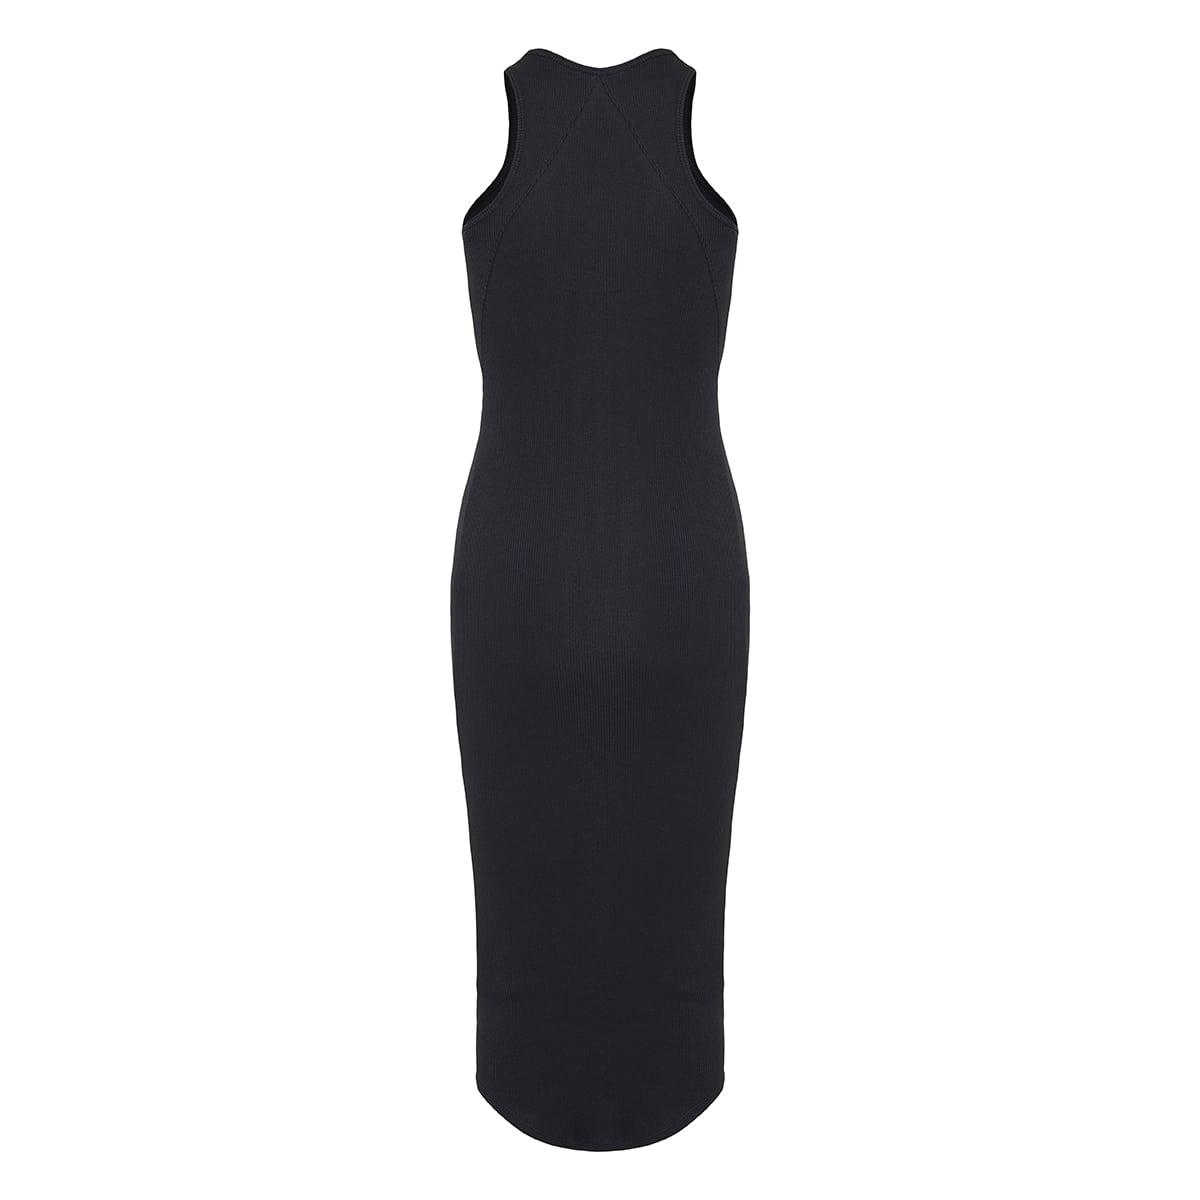 The Essential Rib midi dress